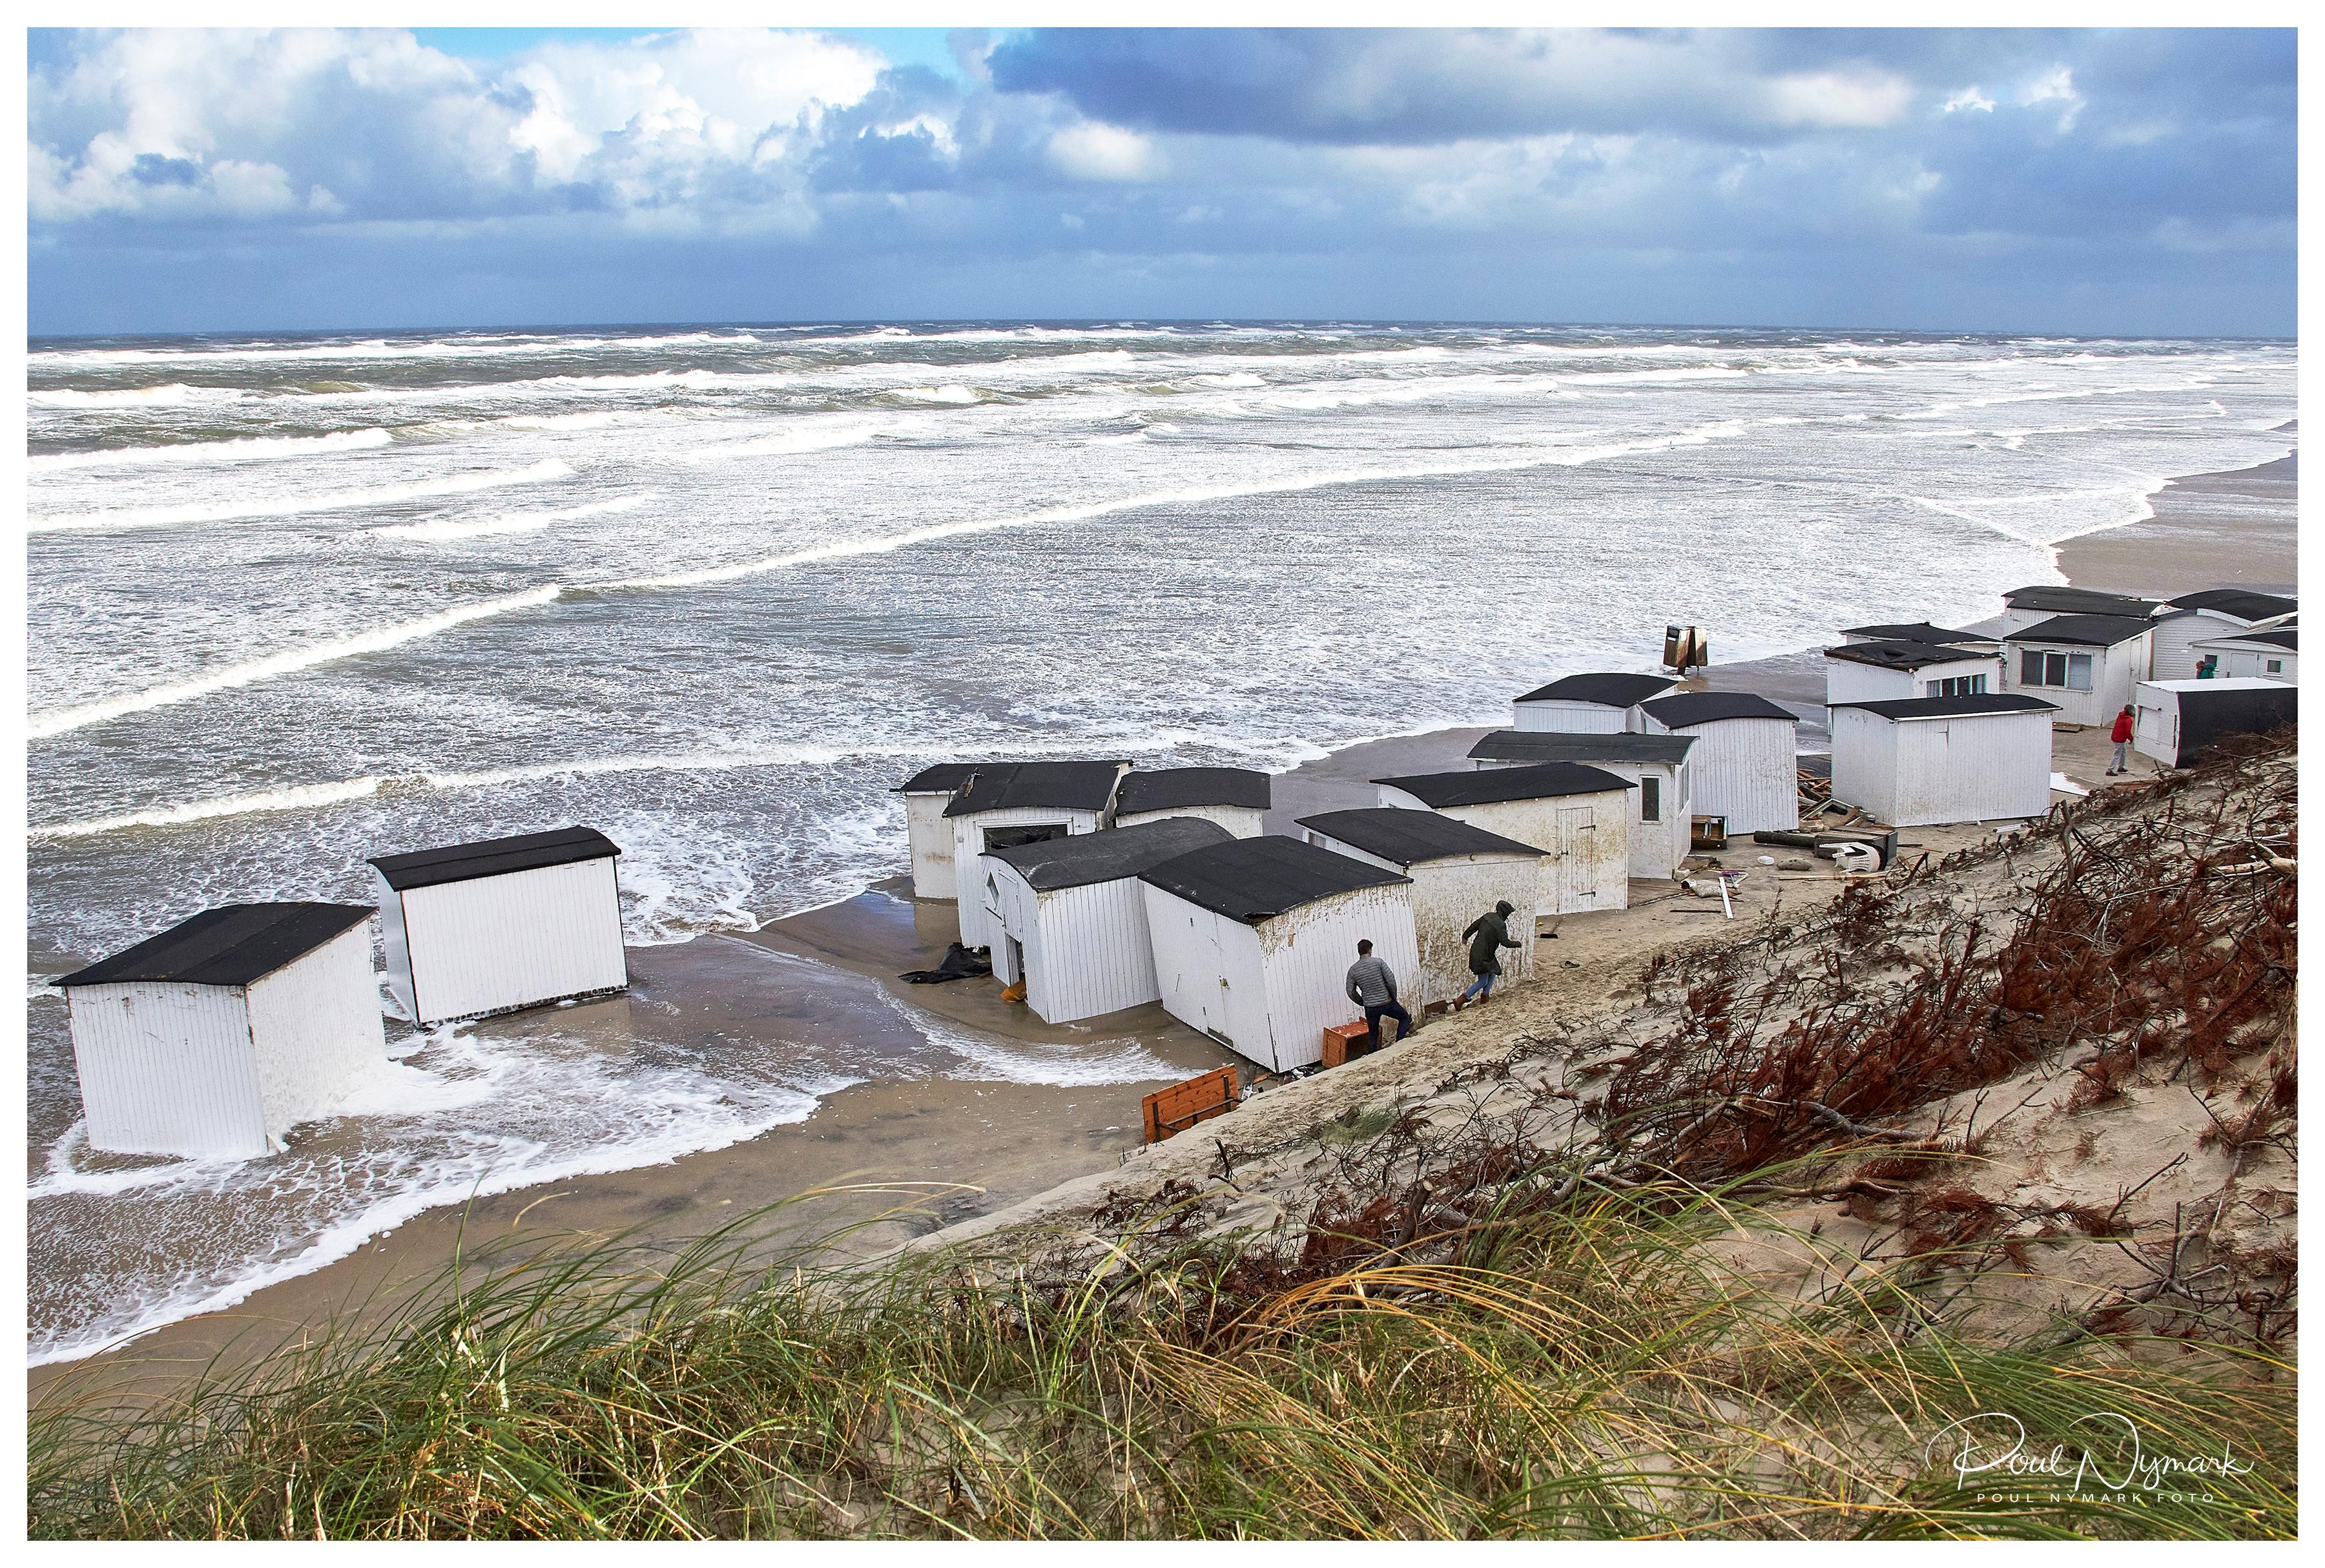 strandhus2.jpg